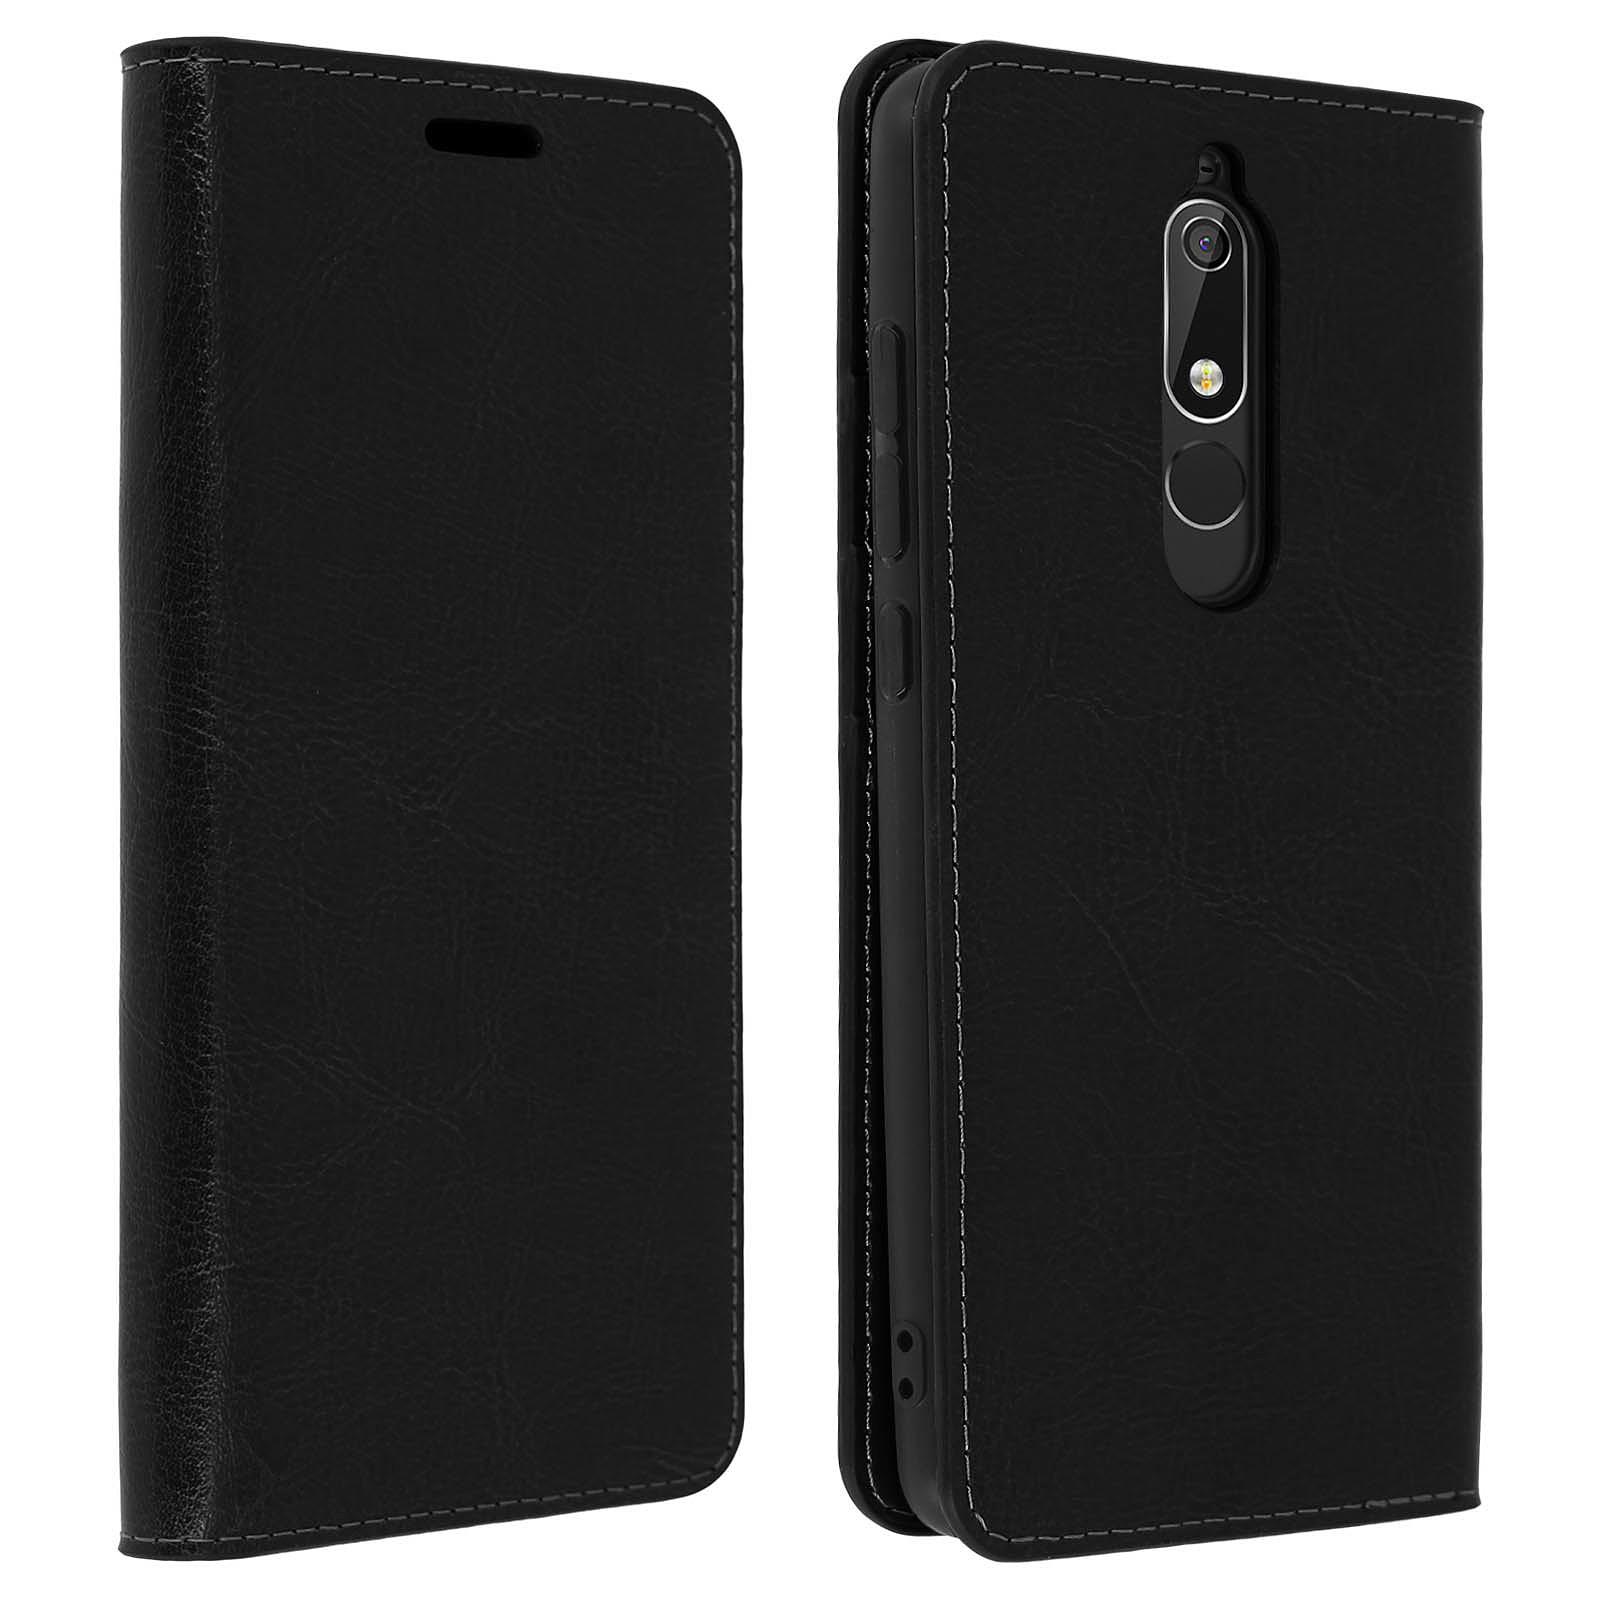 Avizar Etui folio Noir pour Nokia 5.1